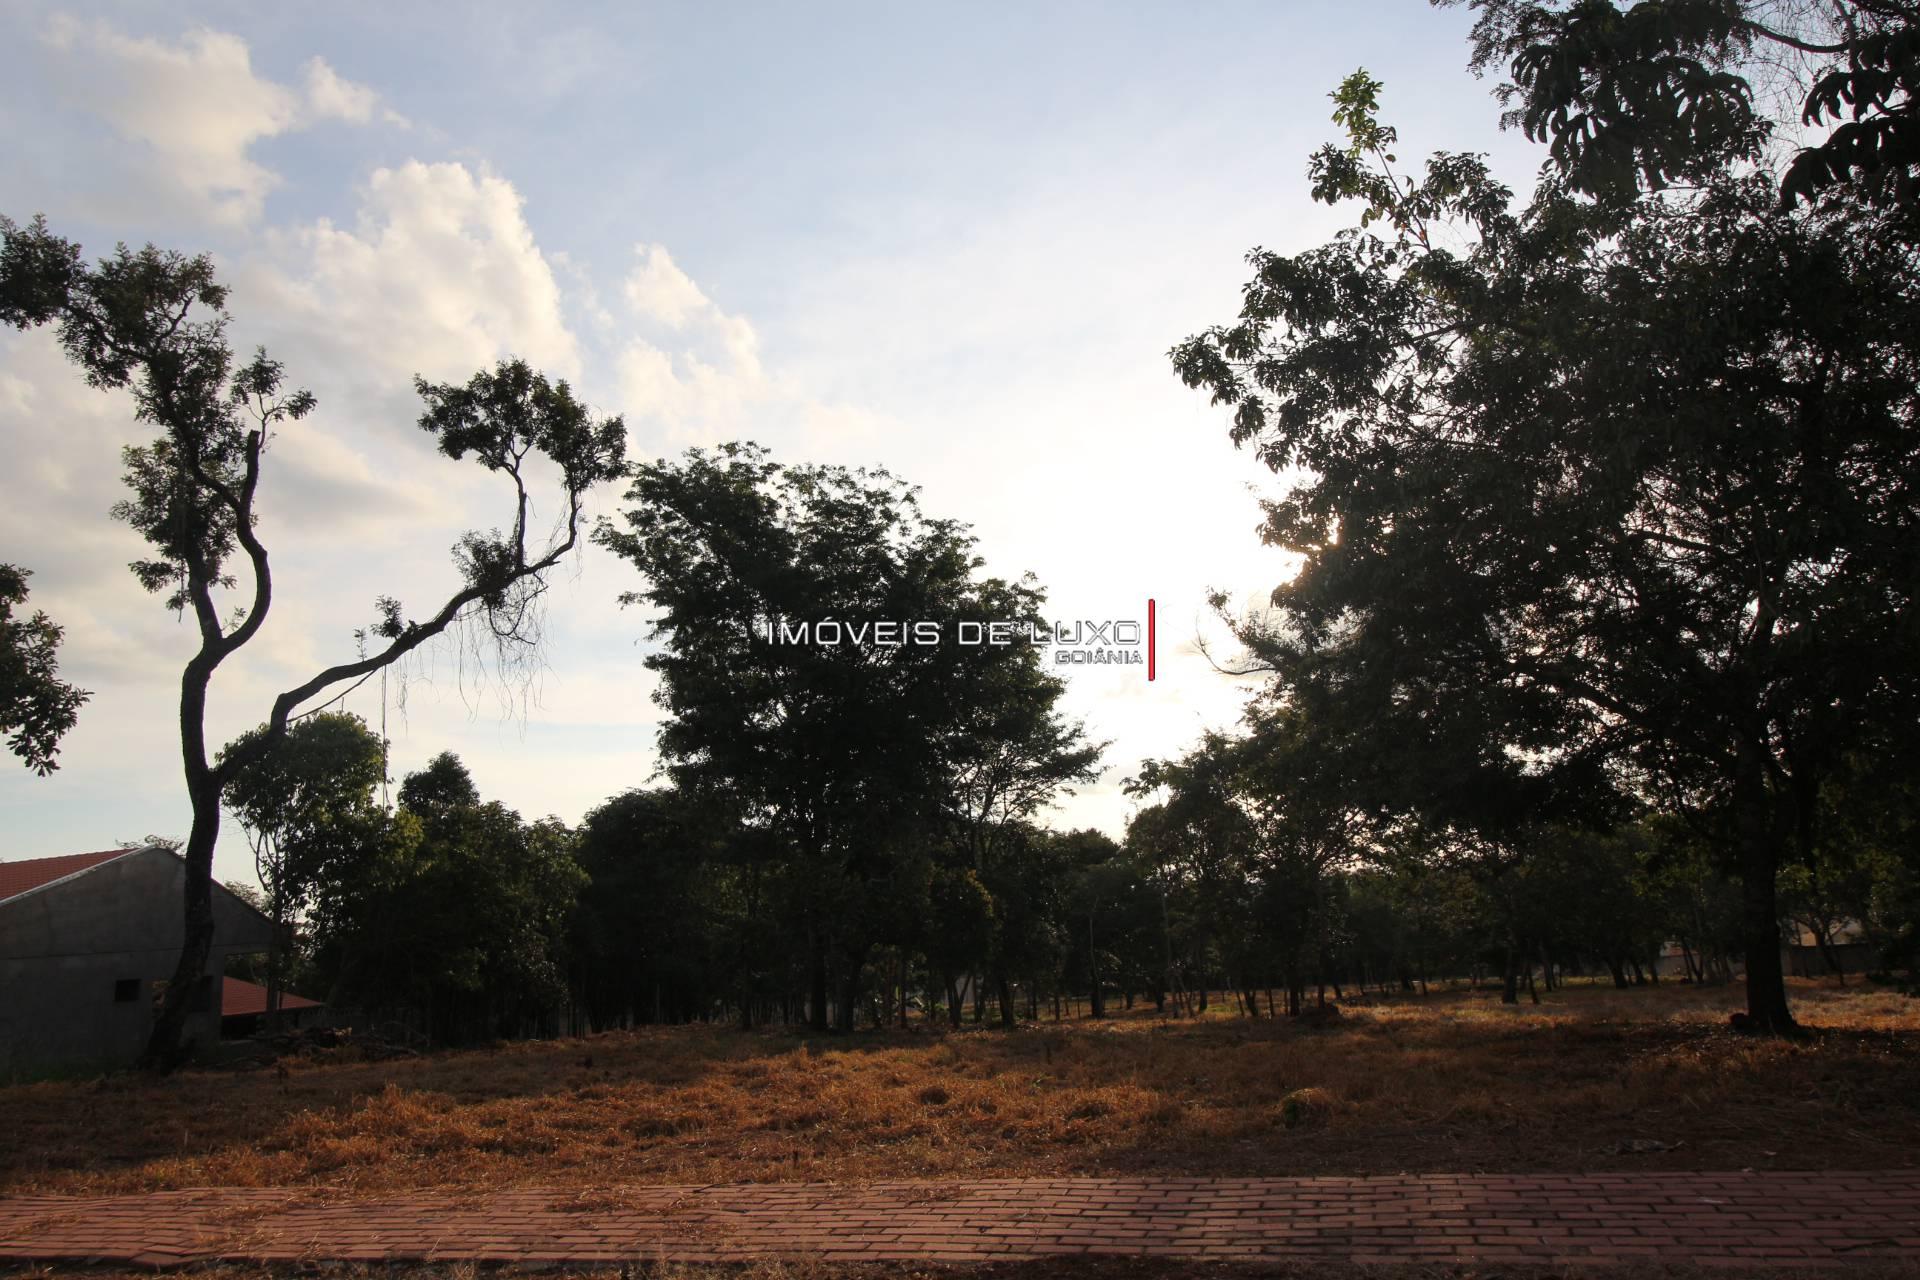 Imóveis de Luxo - 2 lotes à venda no Condomínio de Chácaras Villa Verde